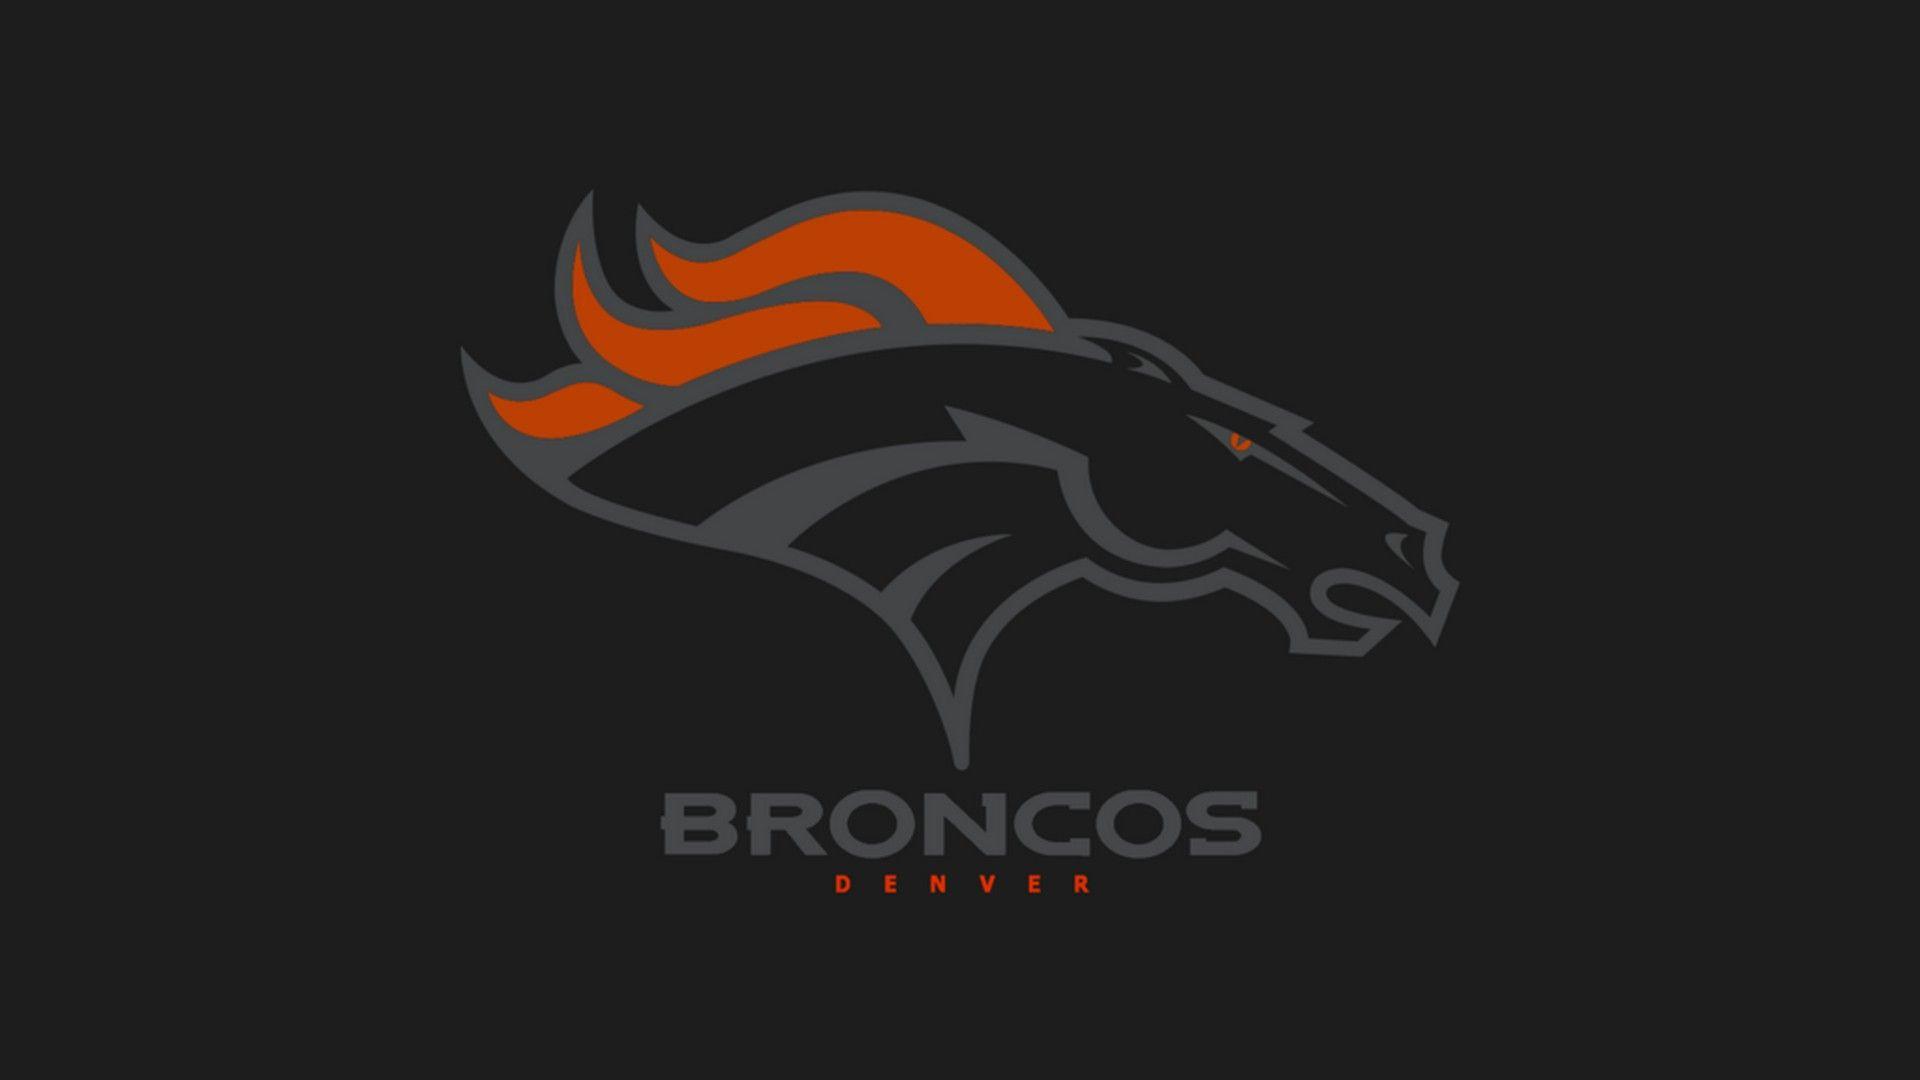 broncos logo wallpapers